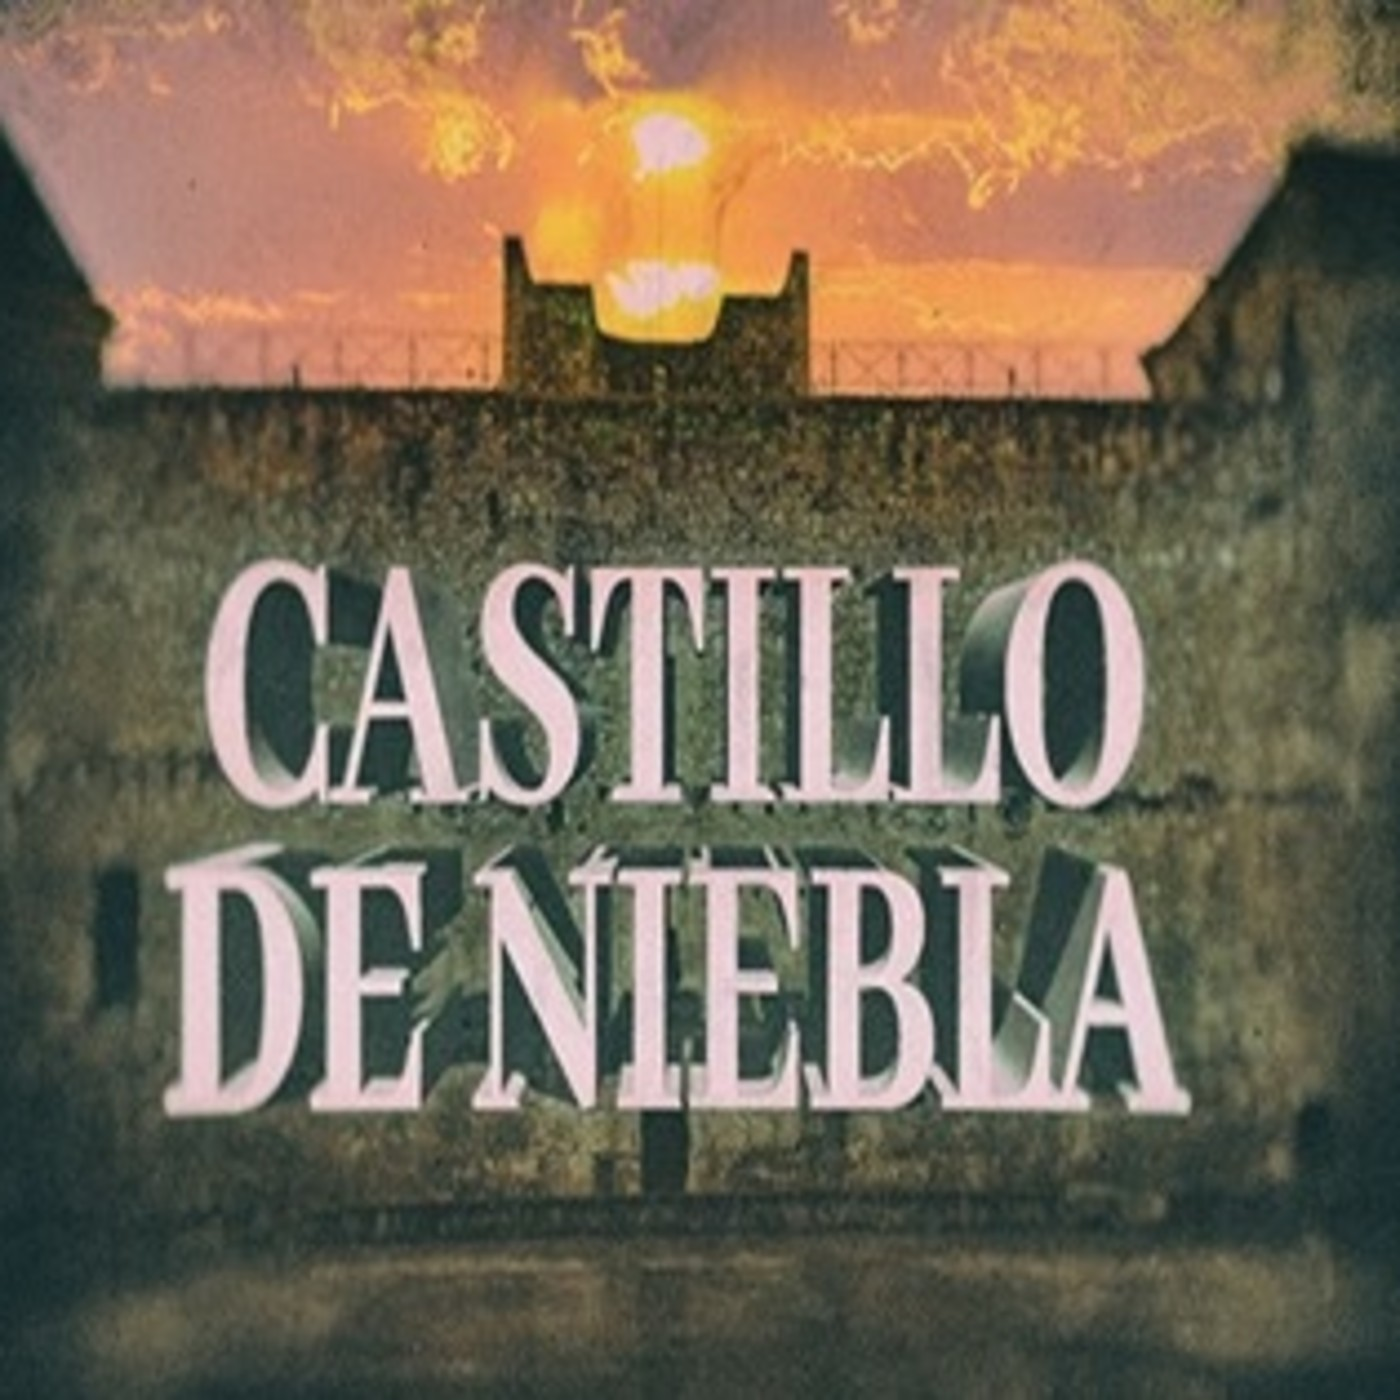 Cuarto Milenio: Castillo de Niebla en Cuarto Milenio ...